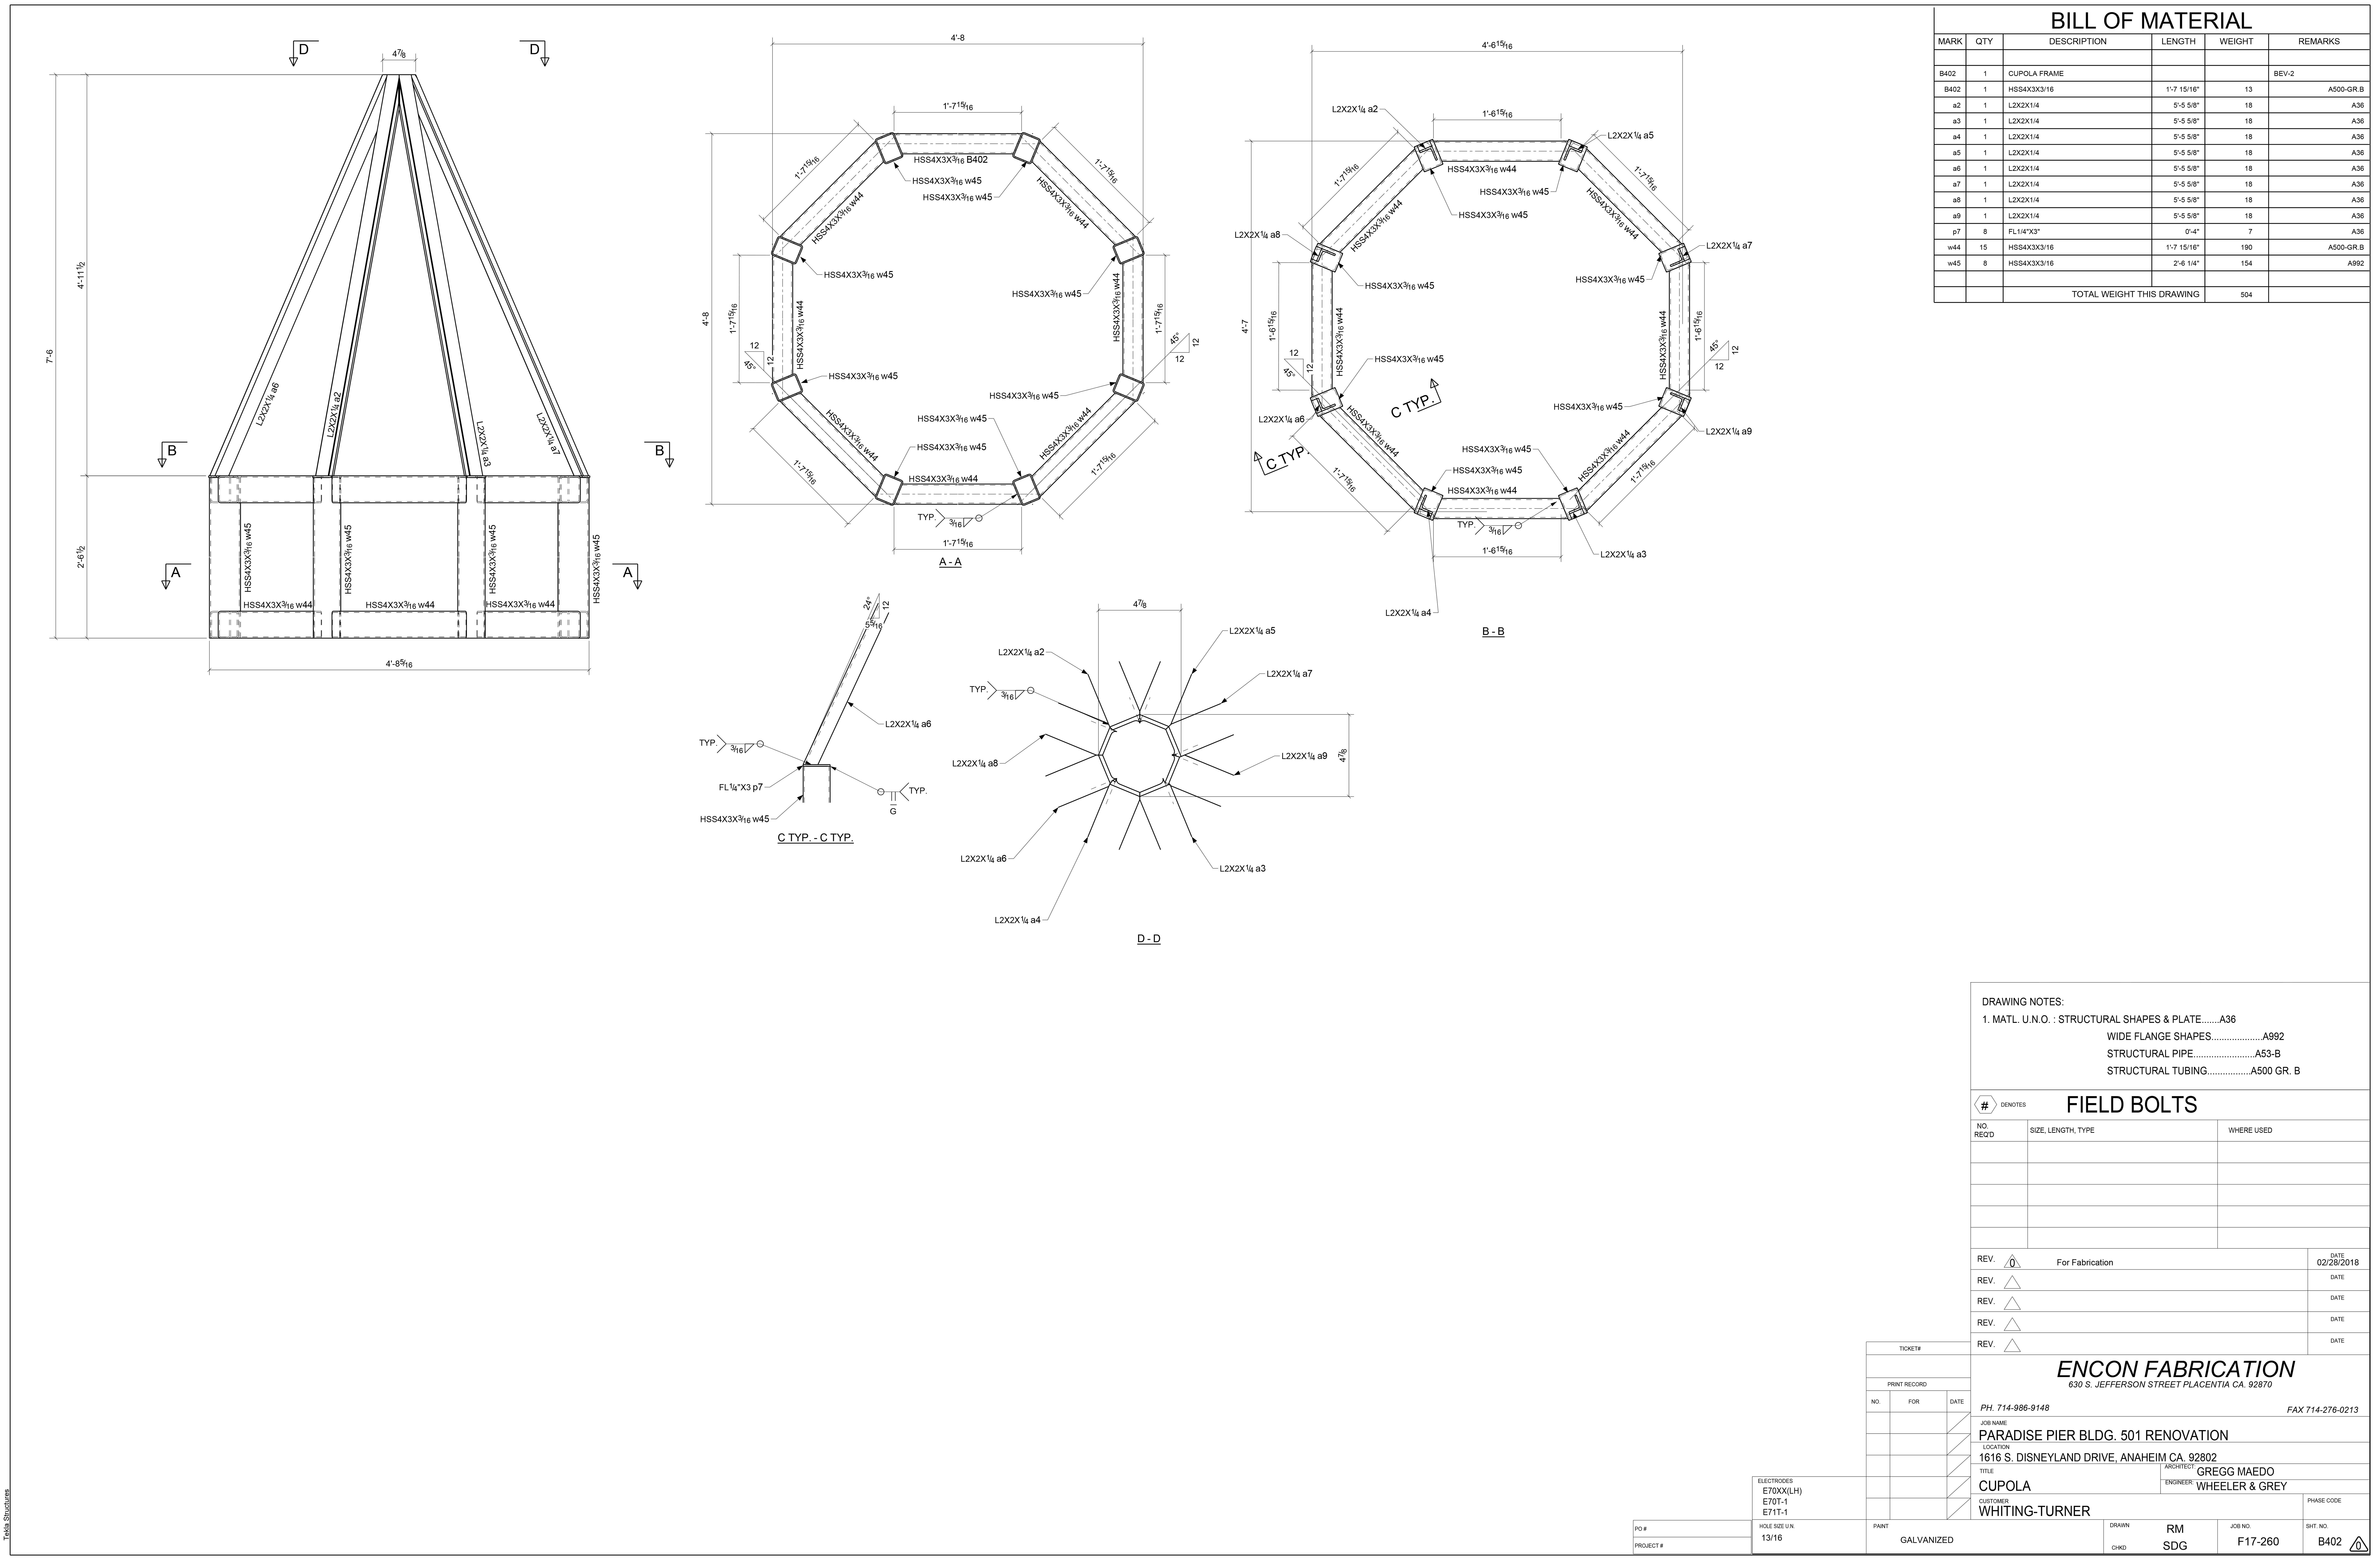 B402 - CUPOLA - Rev 0.jpg